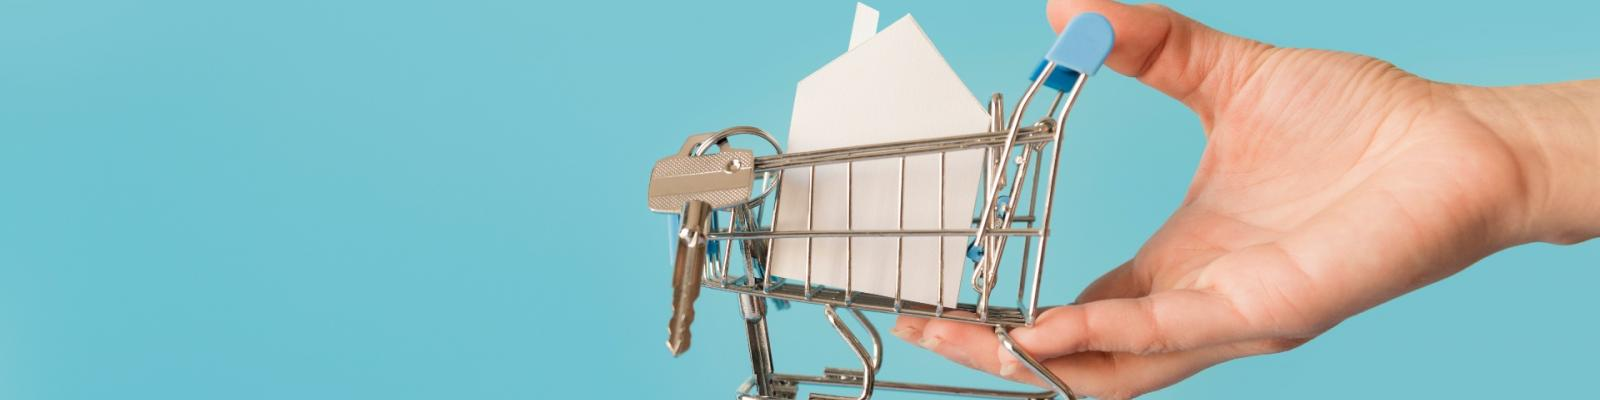 Module 2 examen kredietbemiddeling: consumentenkredieten